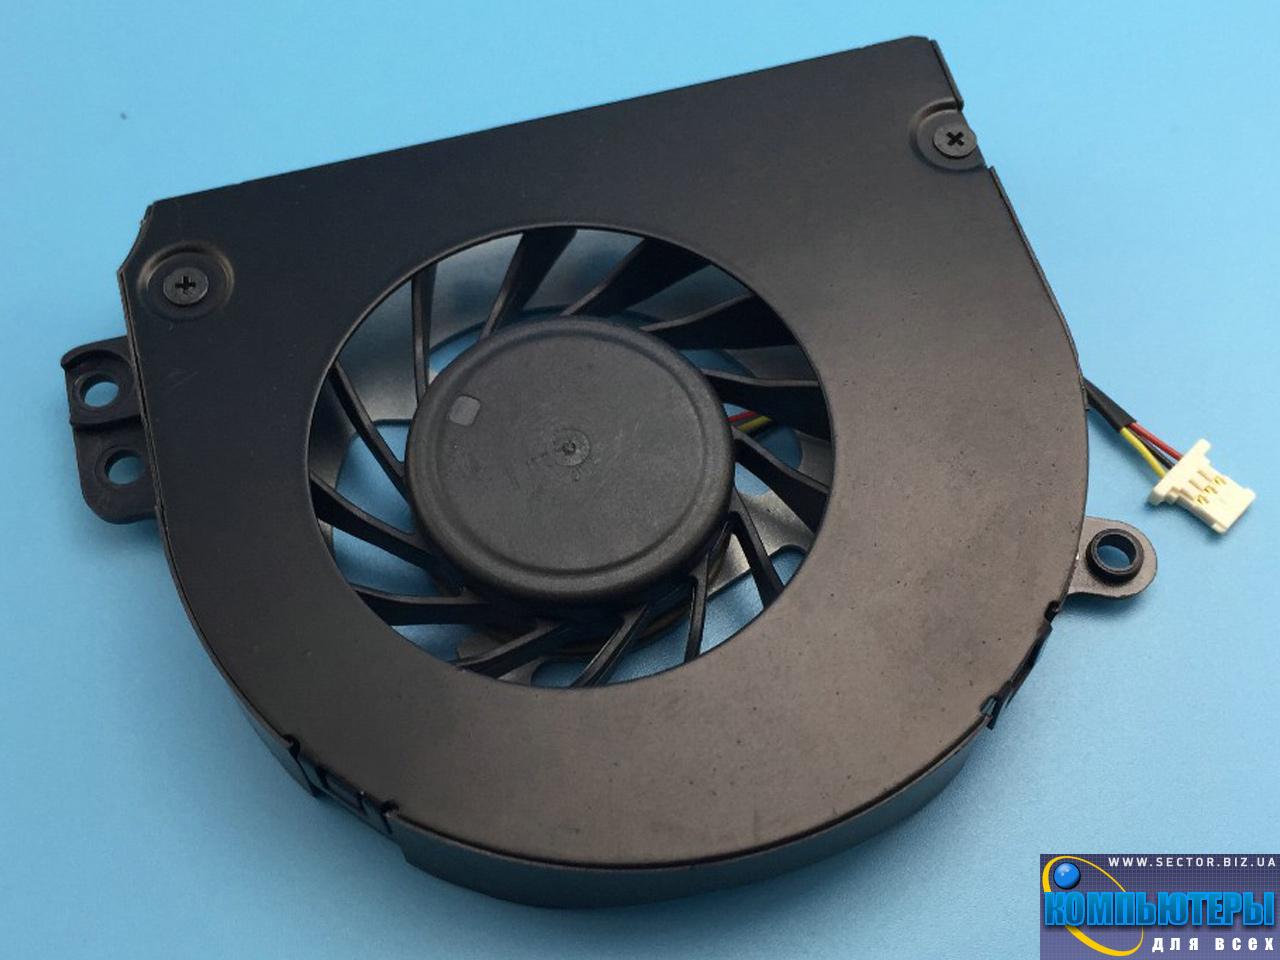 Кулер к ноутбуку Dell Inspiron 1464 1564 1764 P07E P08F P09G p/n: DFS531205HC0T F9S8. Фото № 4.